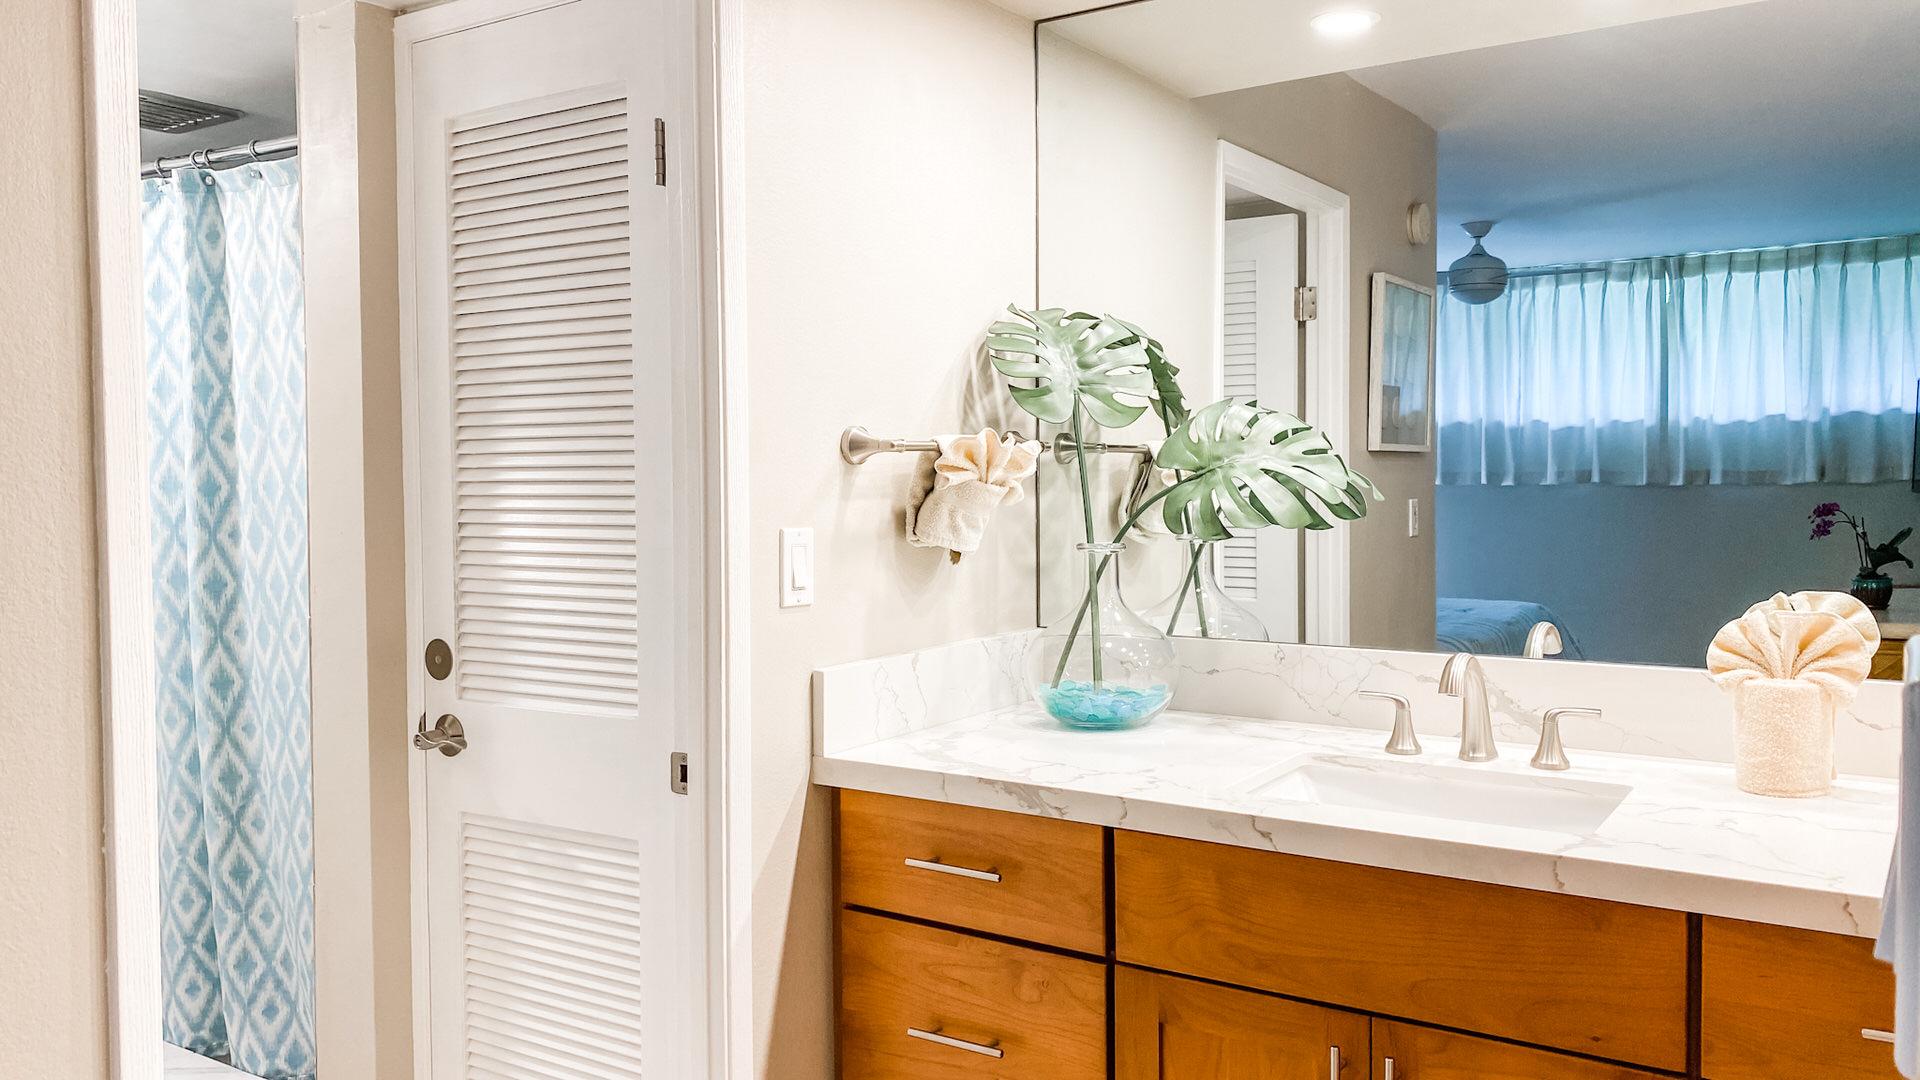 B103 Master Bathroom and Vanity